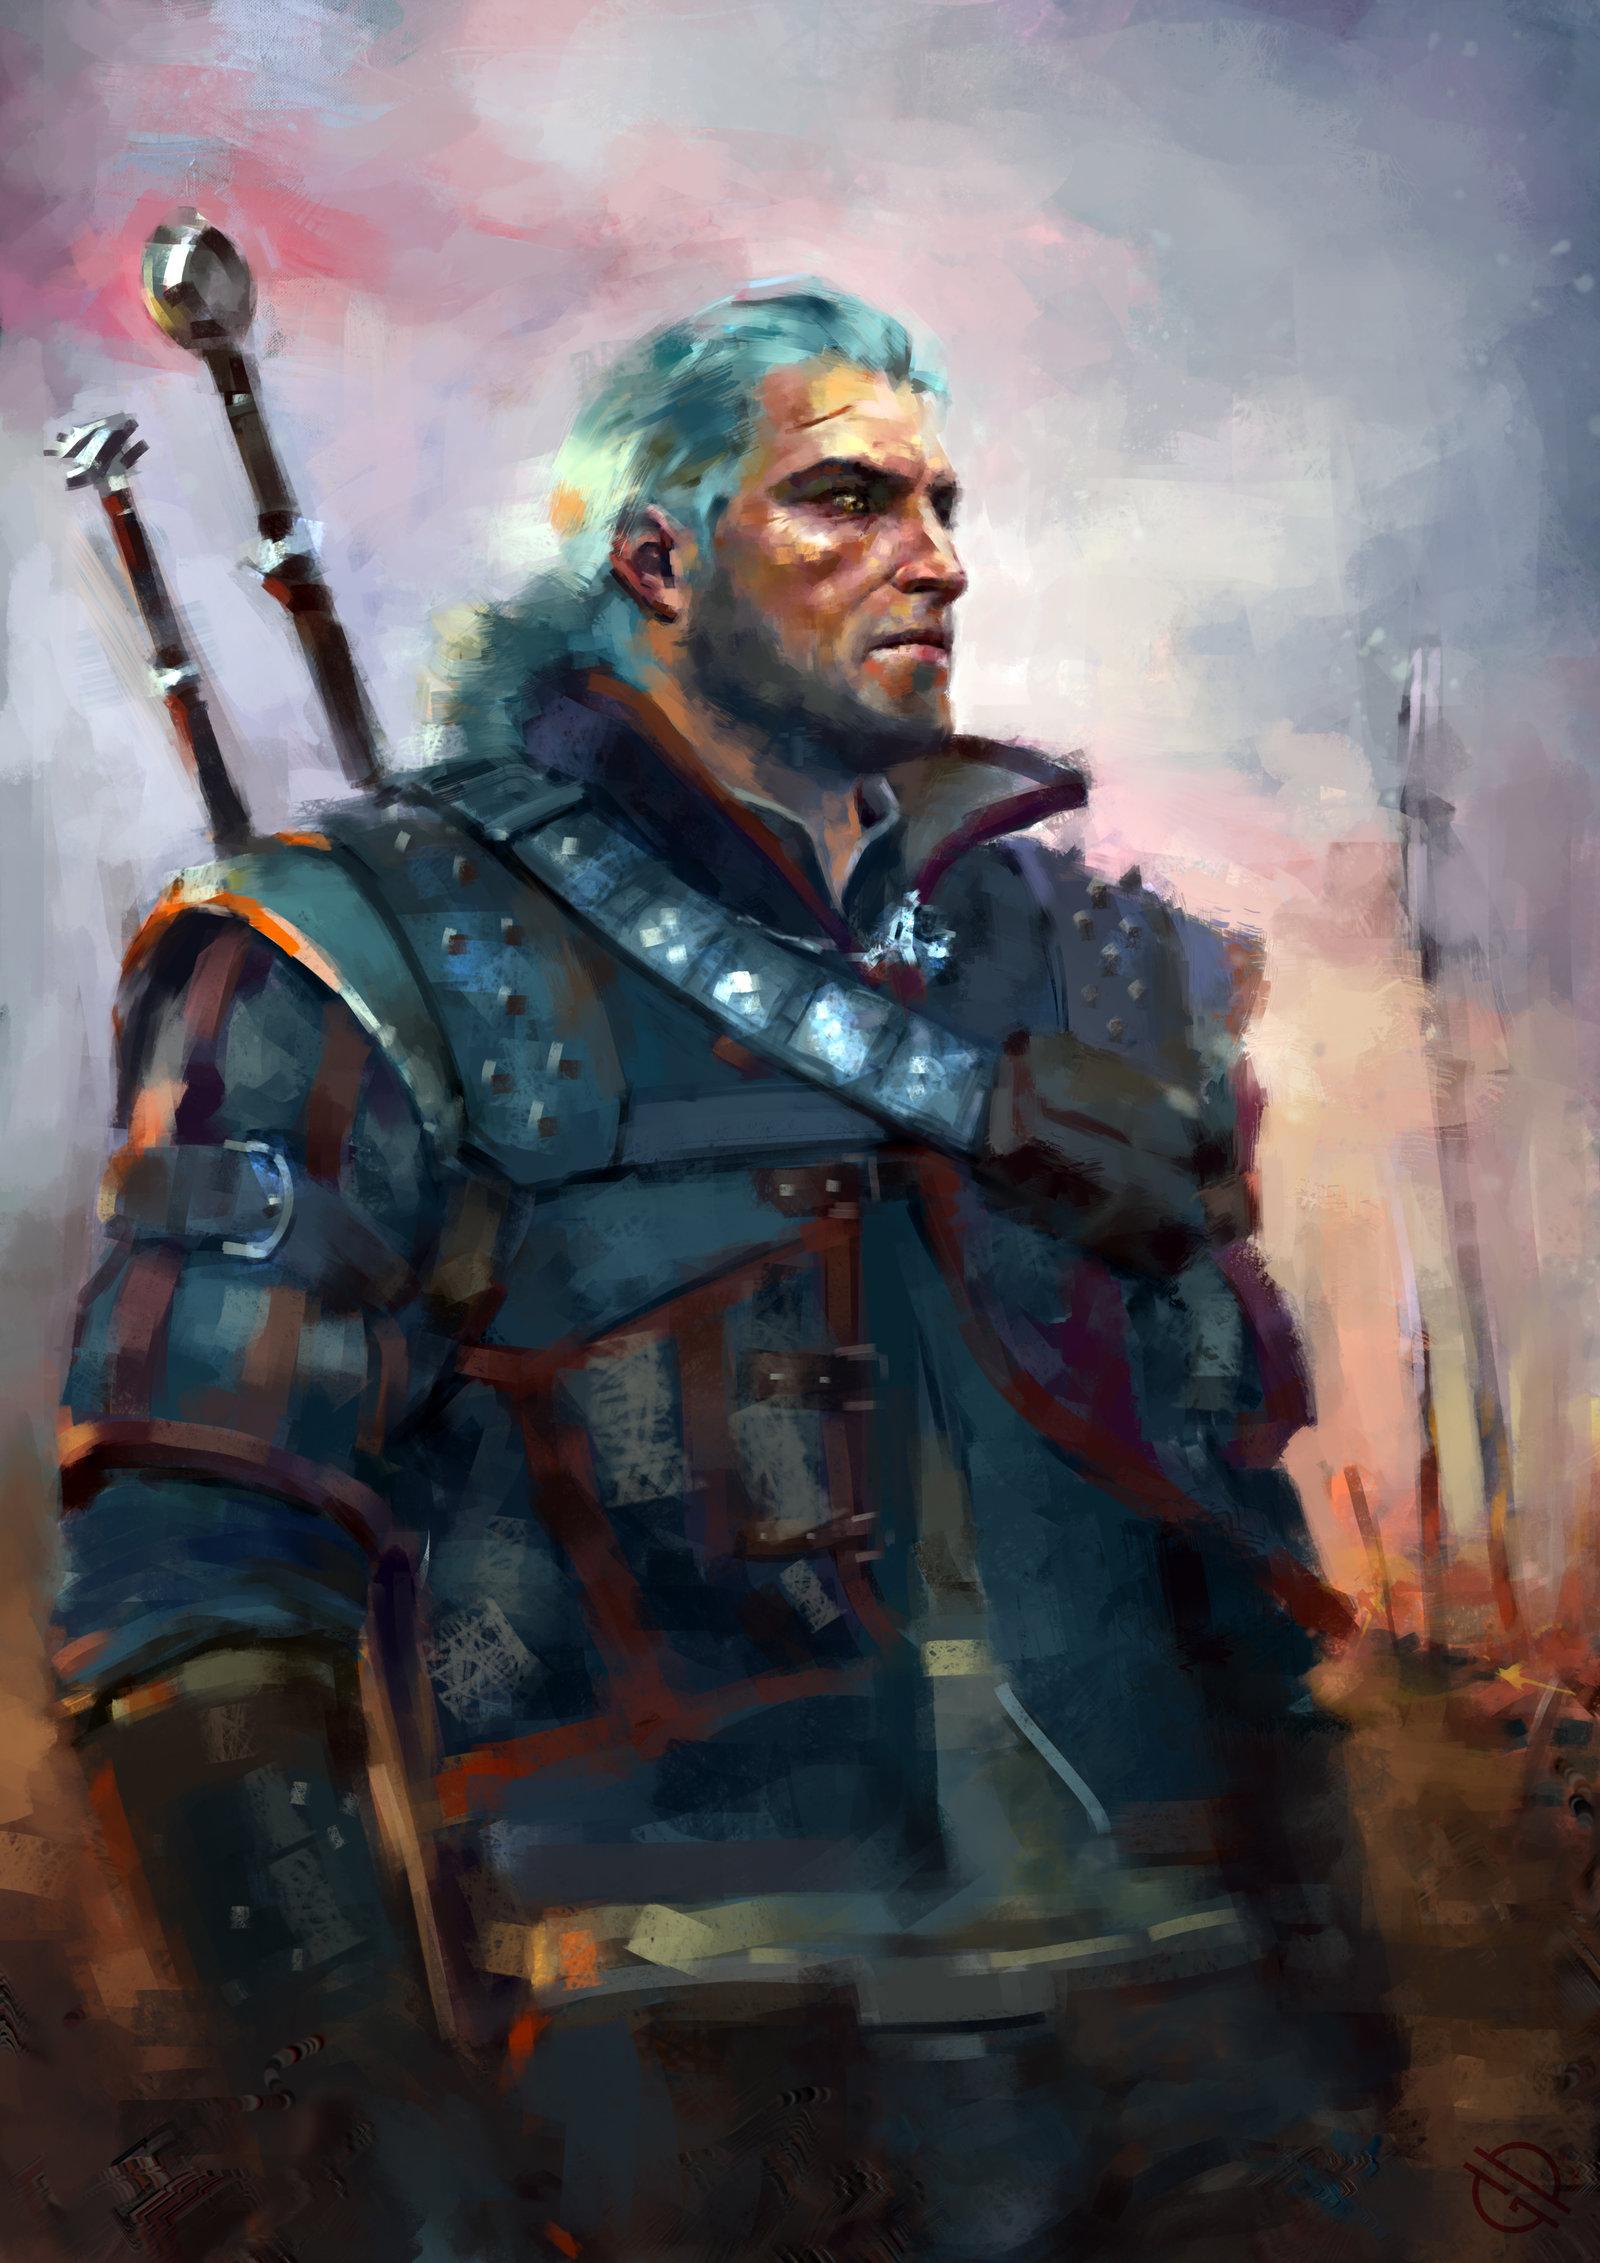 The Witcher 3: Wild Hunt - Witcher 3: Wild Hunt, the